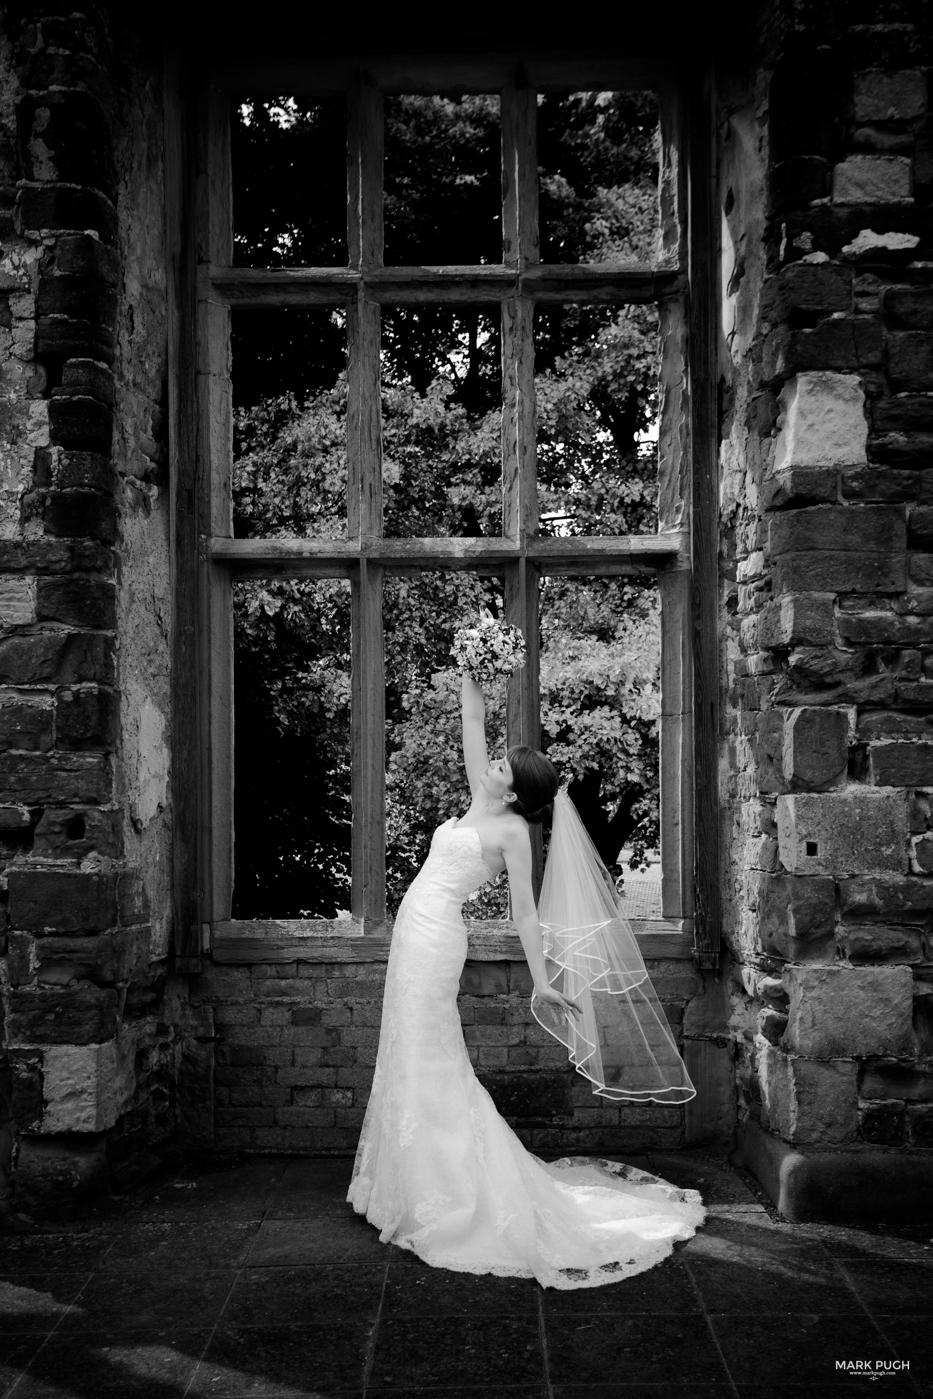 142 Wedding Photography Award winning Wedding Photographer and Videographer Mark Pugh www.markpugh.com.JPG